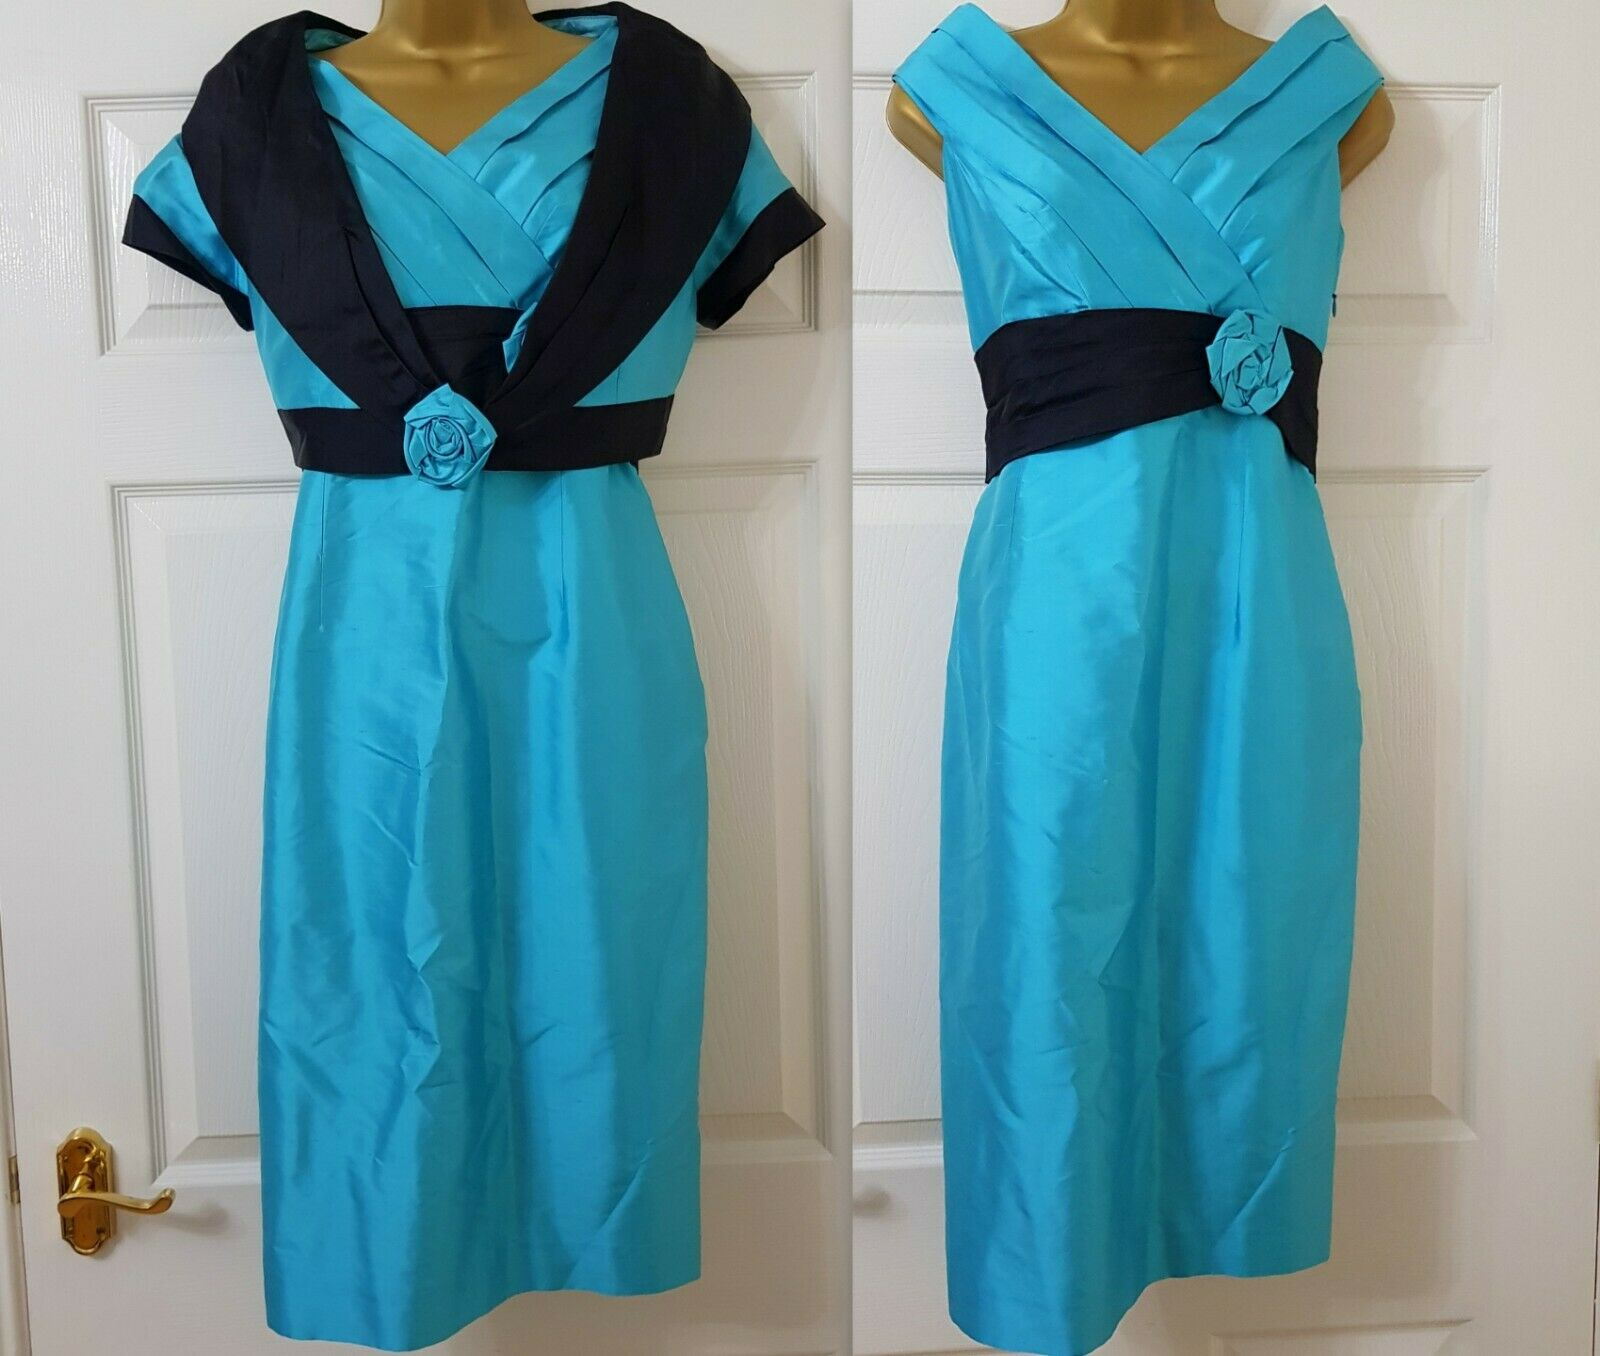 New PRESEN Turquoise Blue & Black Mother Bride Outfit Taffeta dress Jacket UK 12